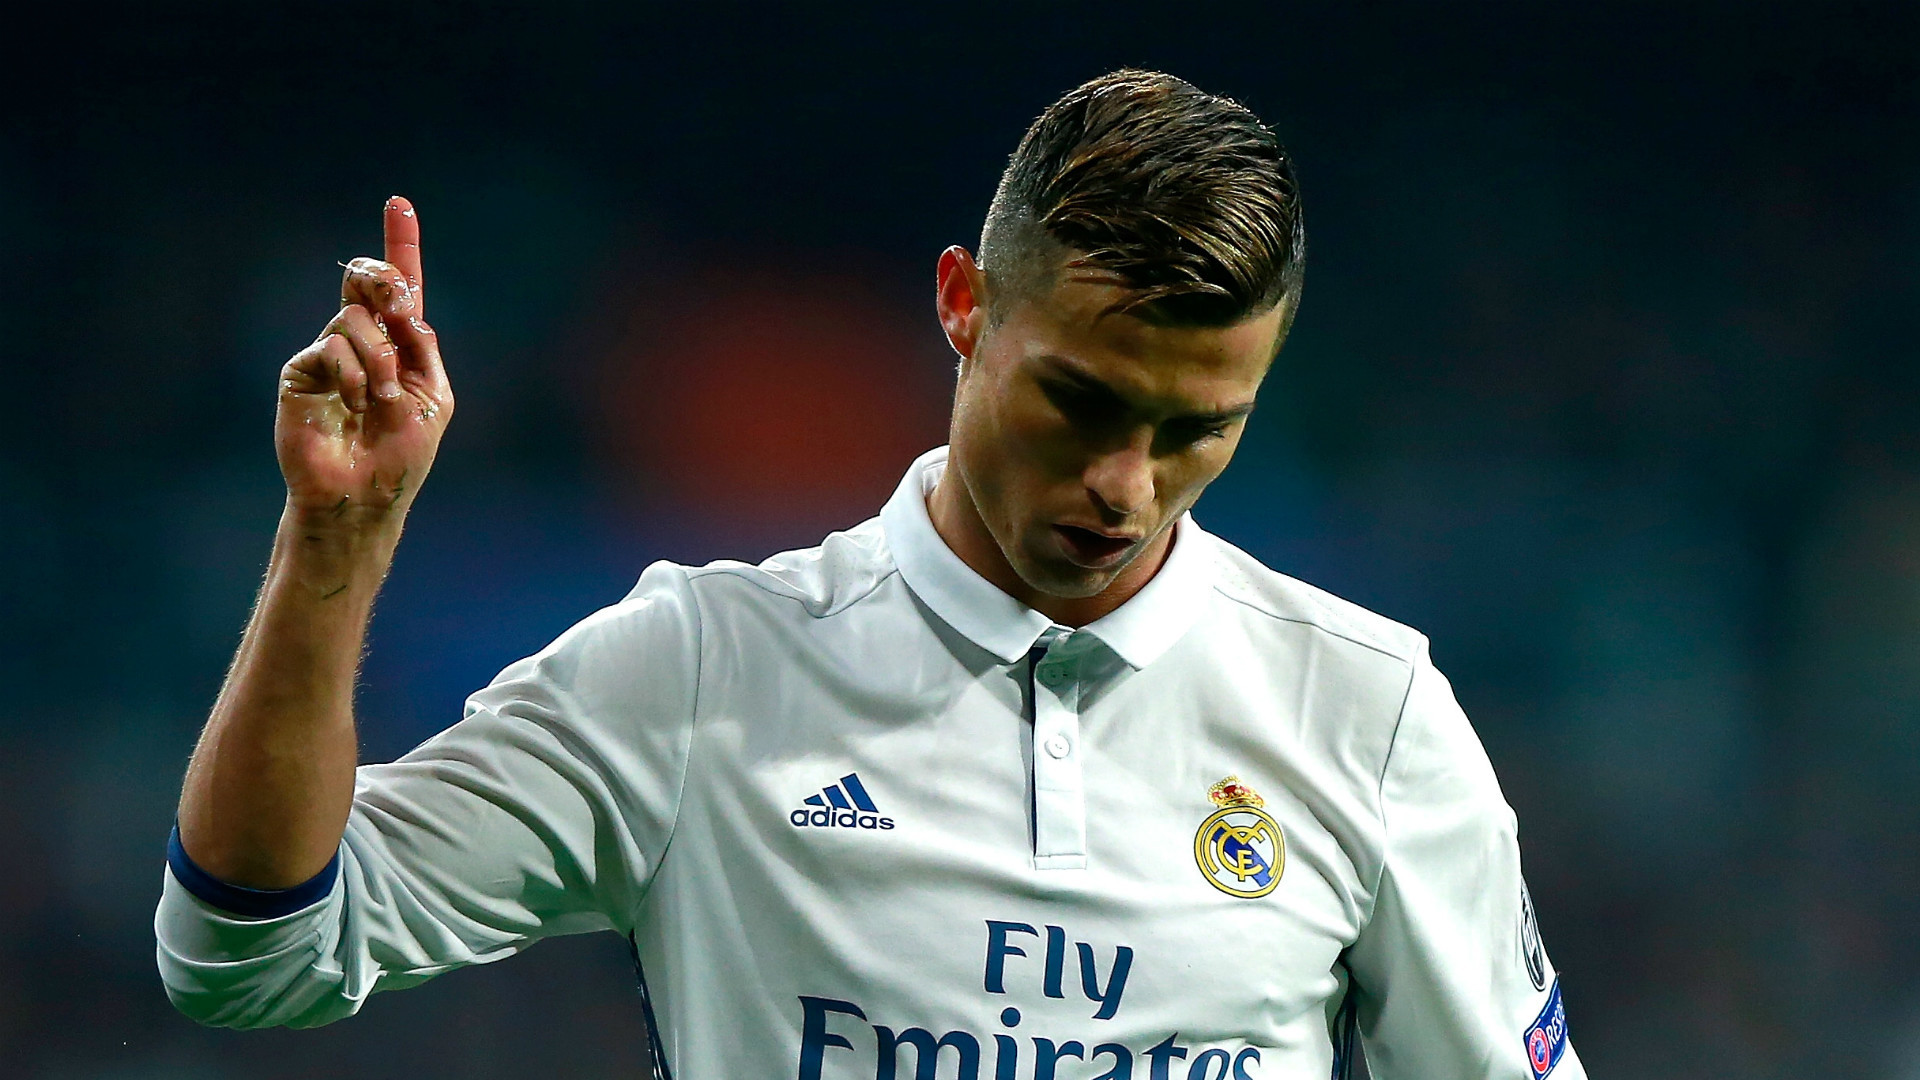 Cristiano Ronaldo Wallpapers 2018 Hd Wallpapertag